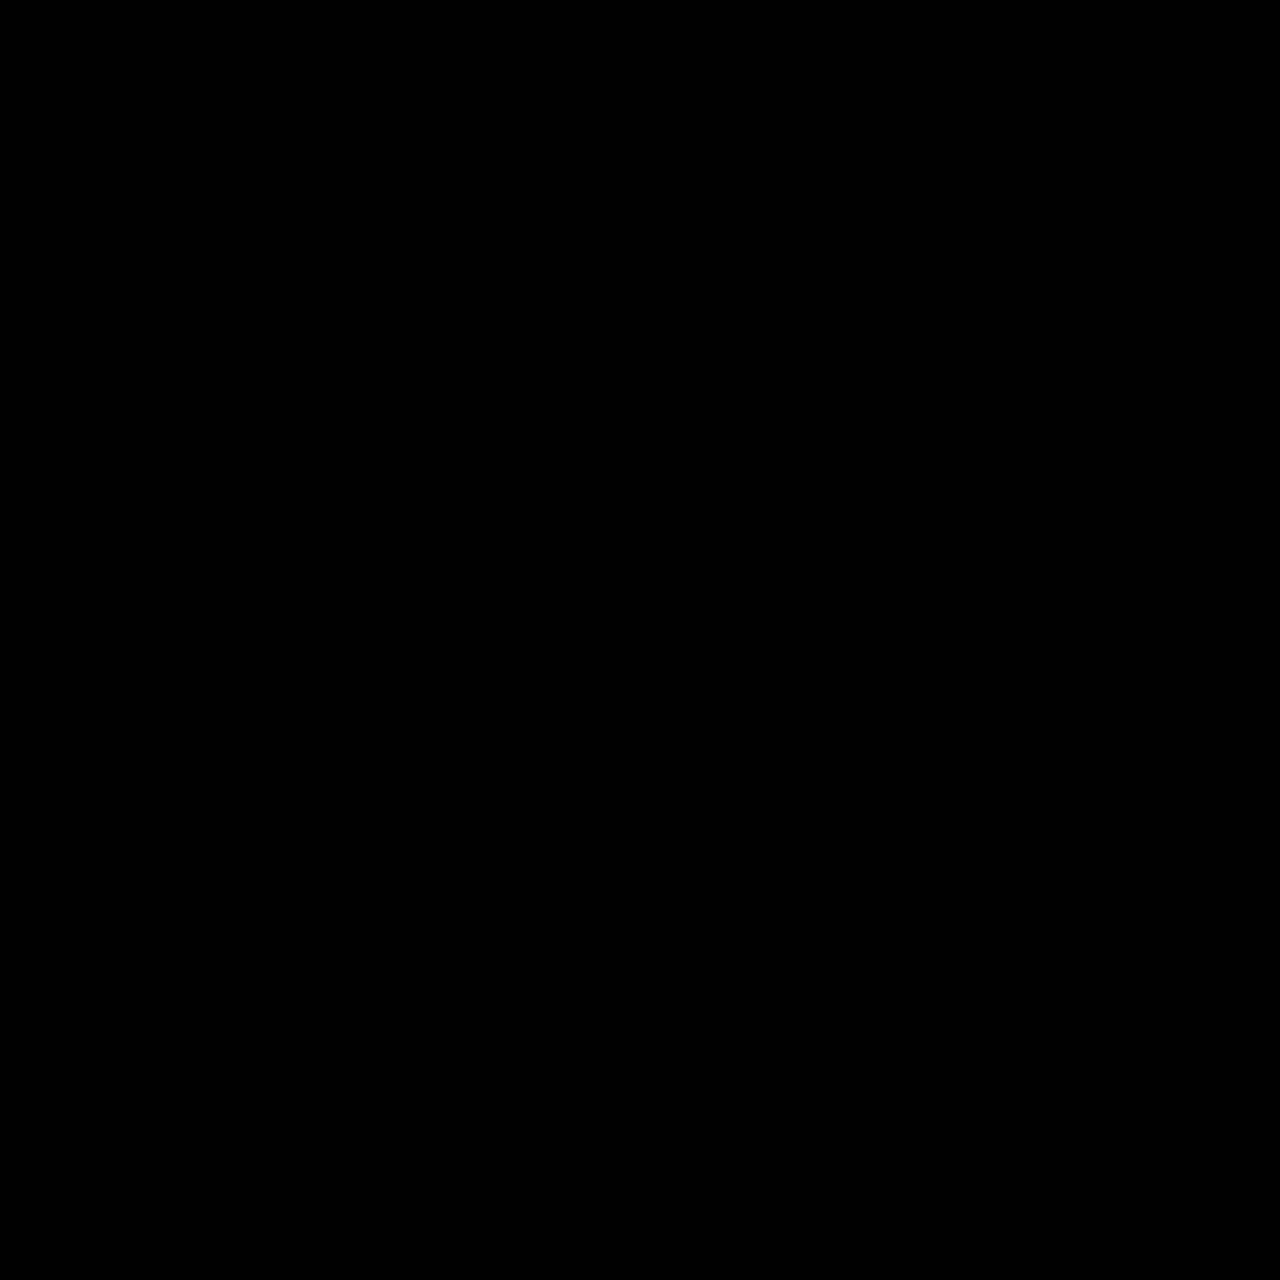 T90.0.0 Black